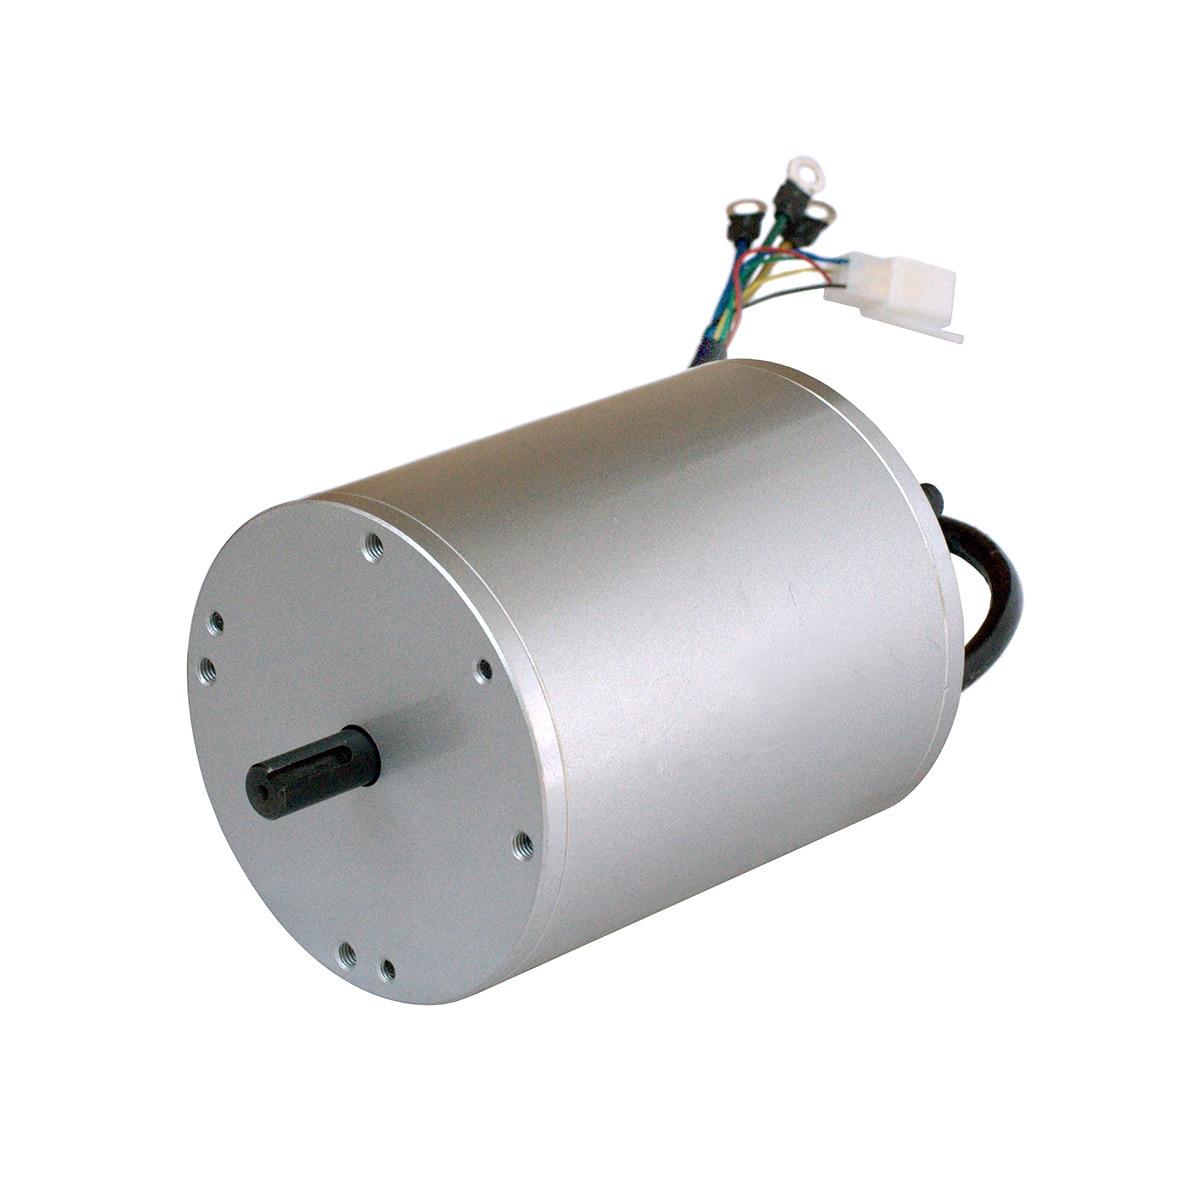 Brushless DC motor 1500W 24V low noise electric motor